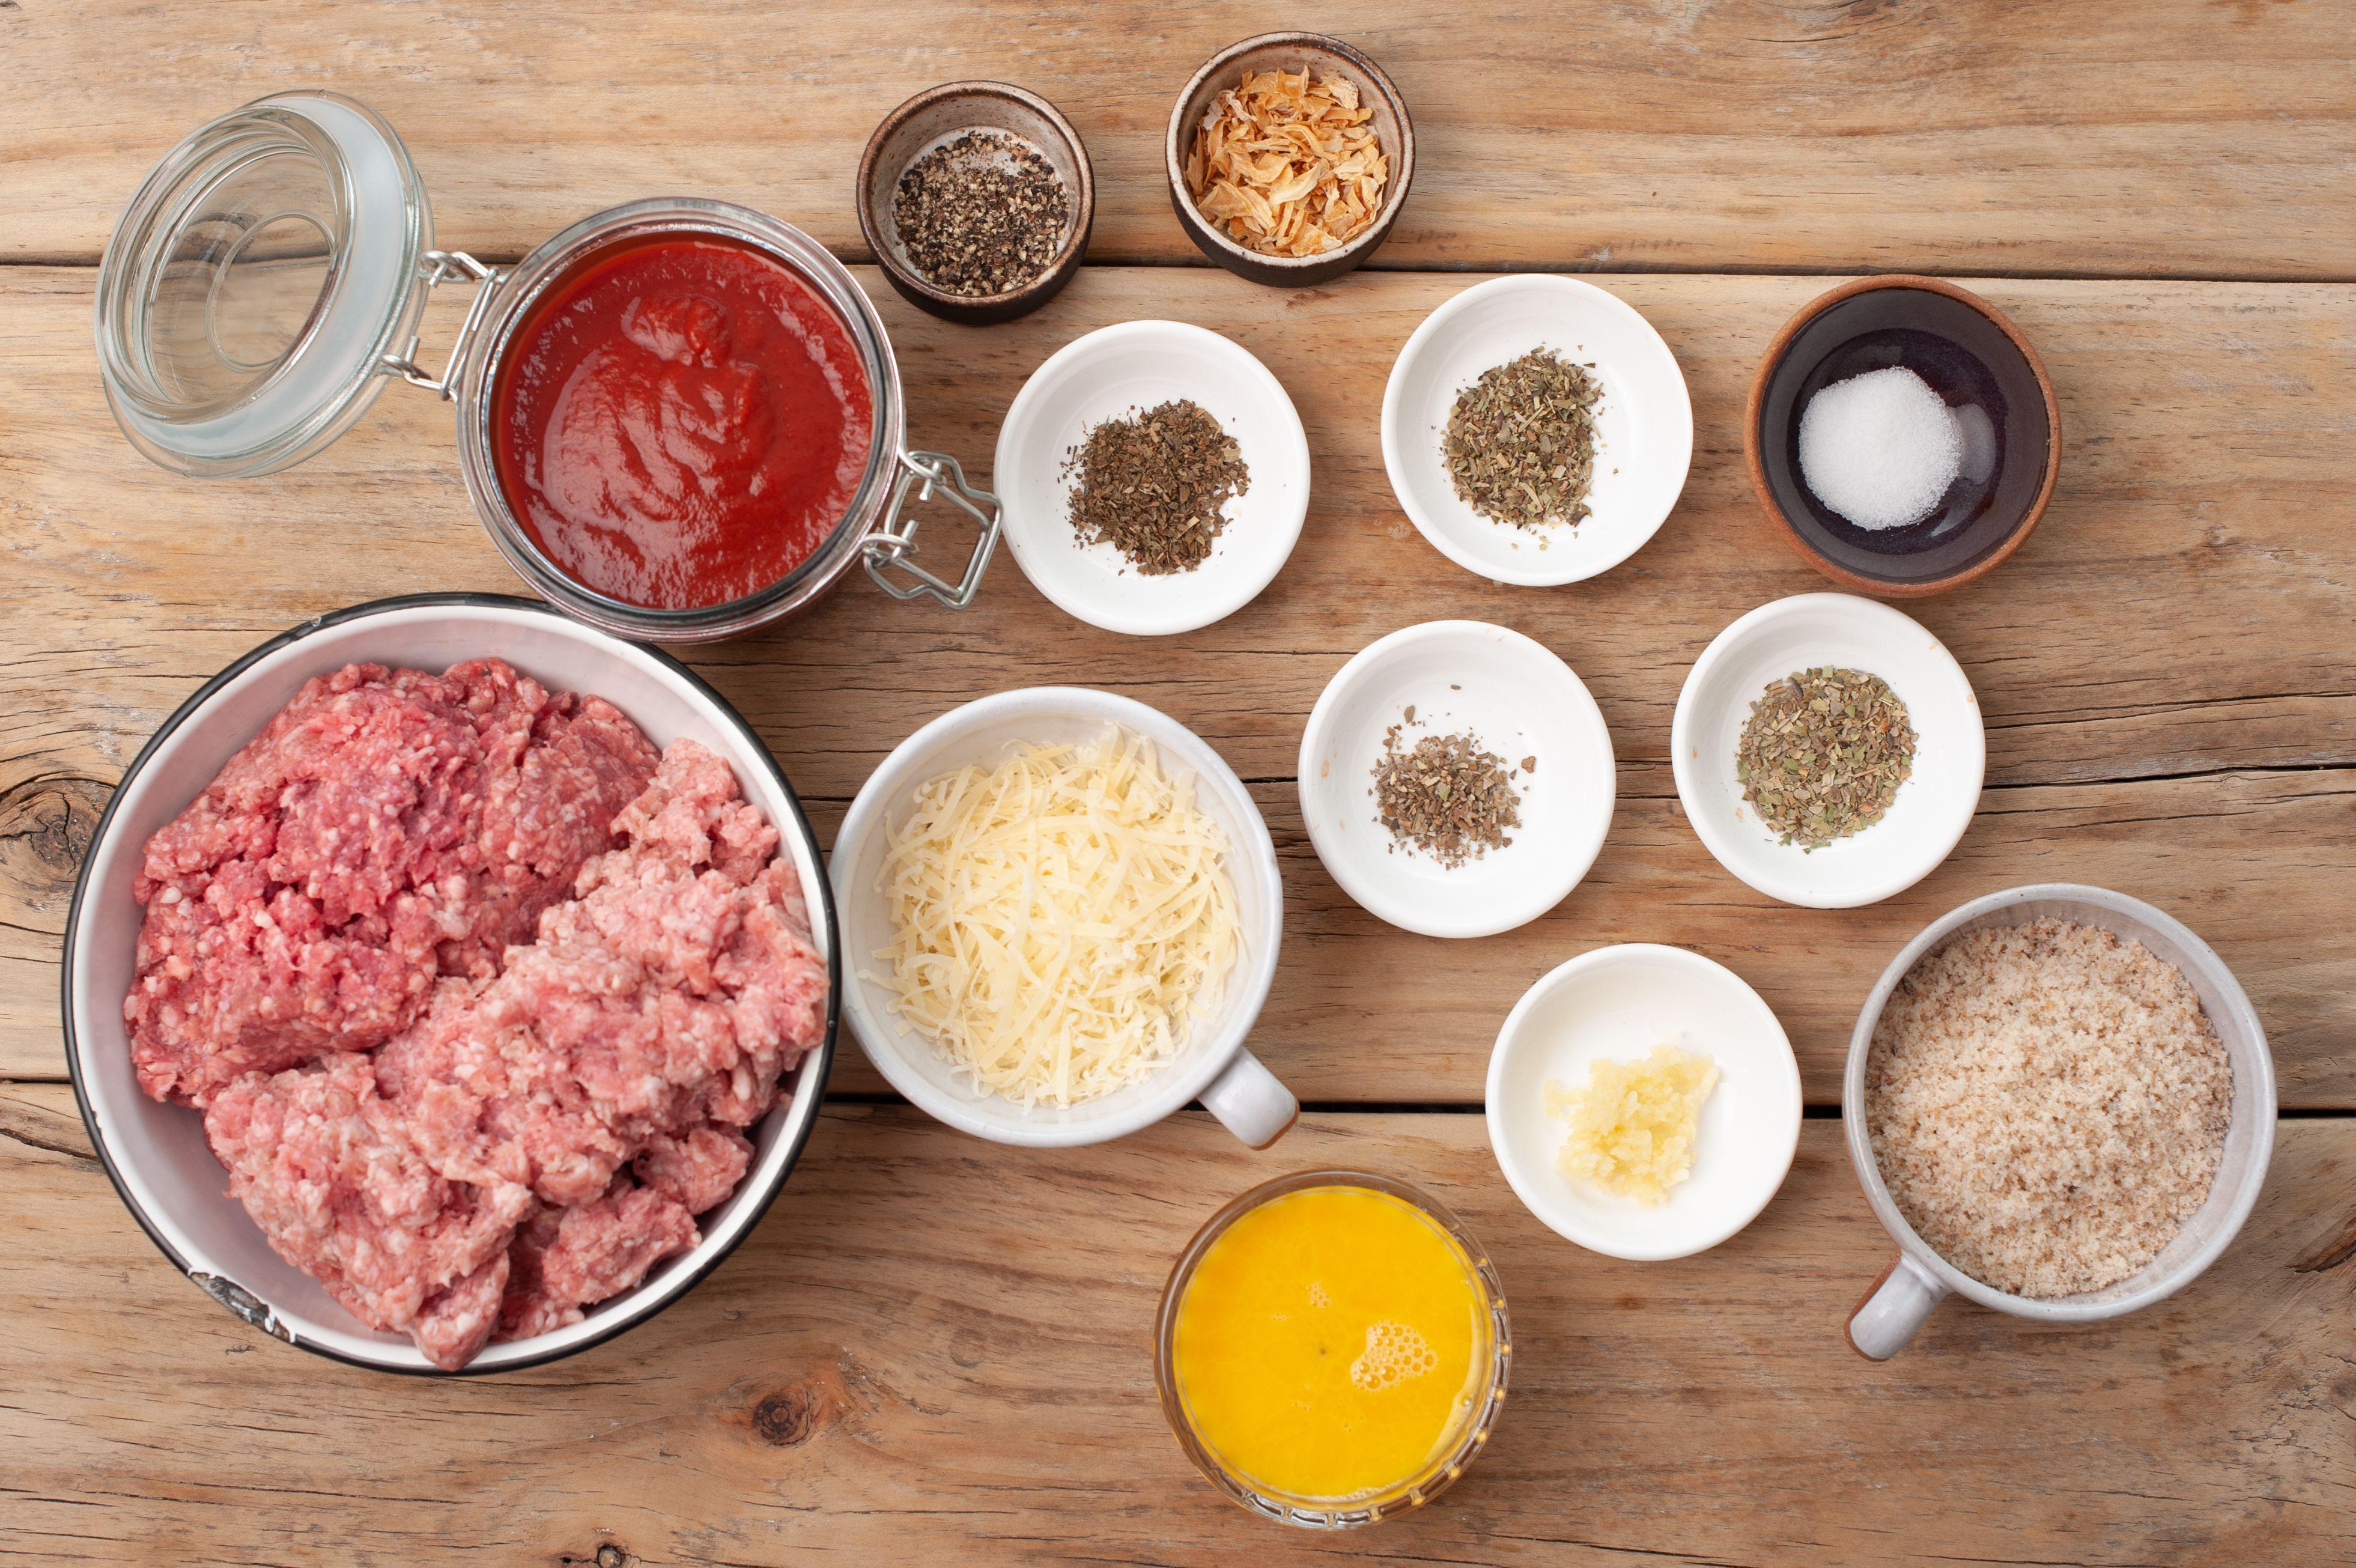 Ingredients for Italian meatloaf